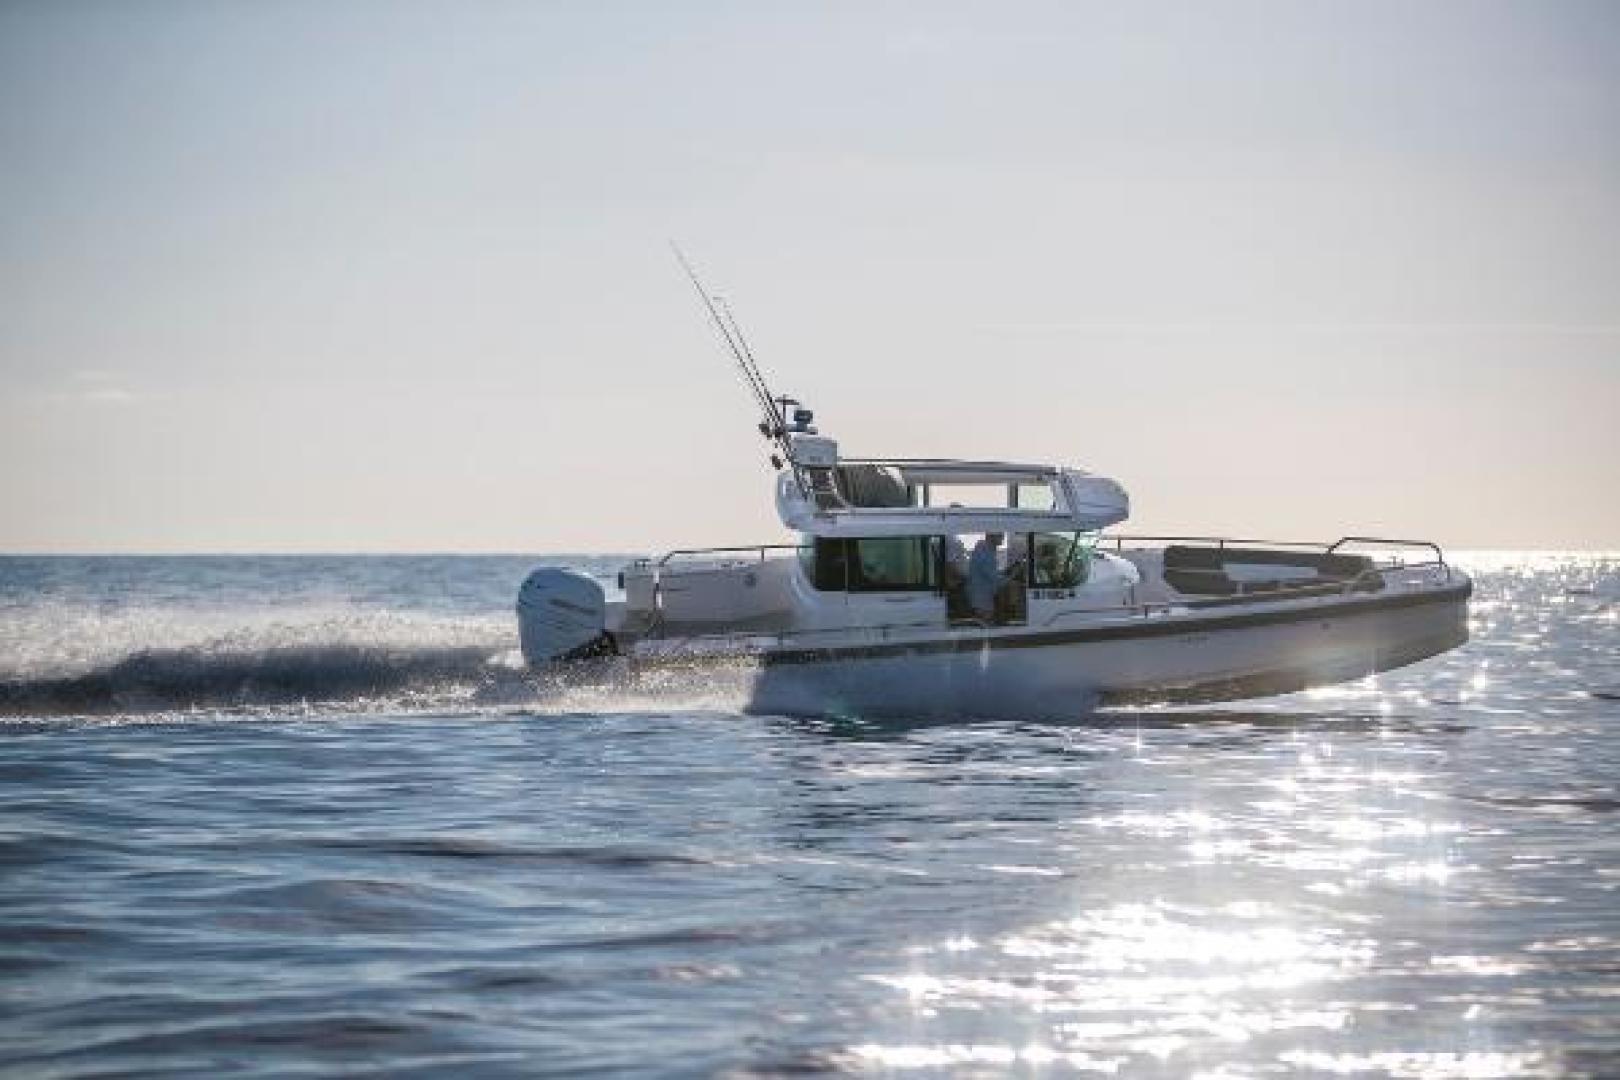 Axopar-28 CABIN 2021-Axopar 28 CABIN Tampa Bay-Florida-United States-1531680 | Thumbnail